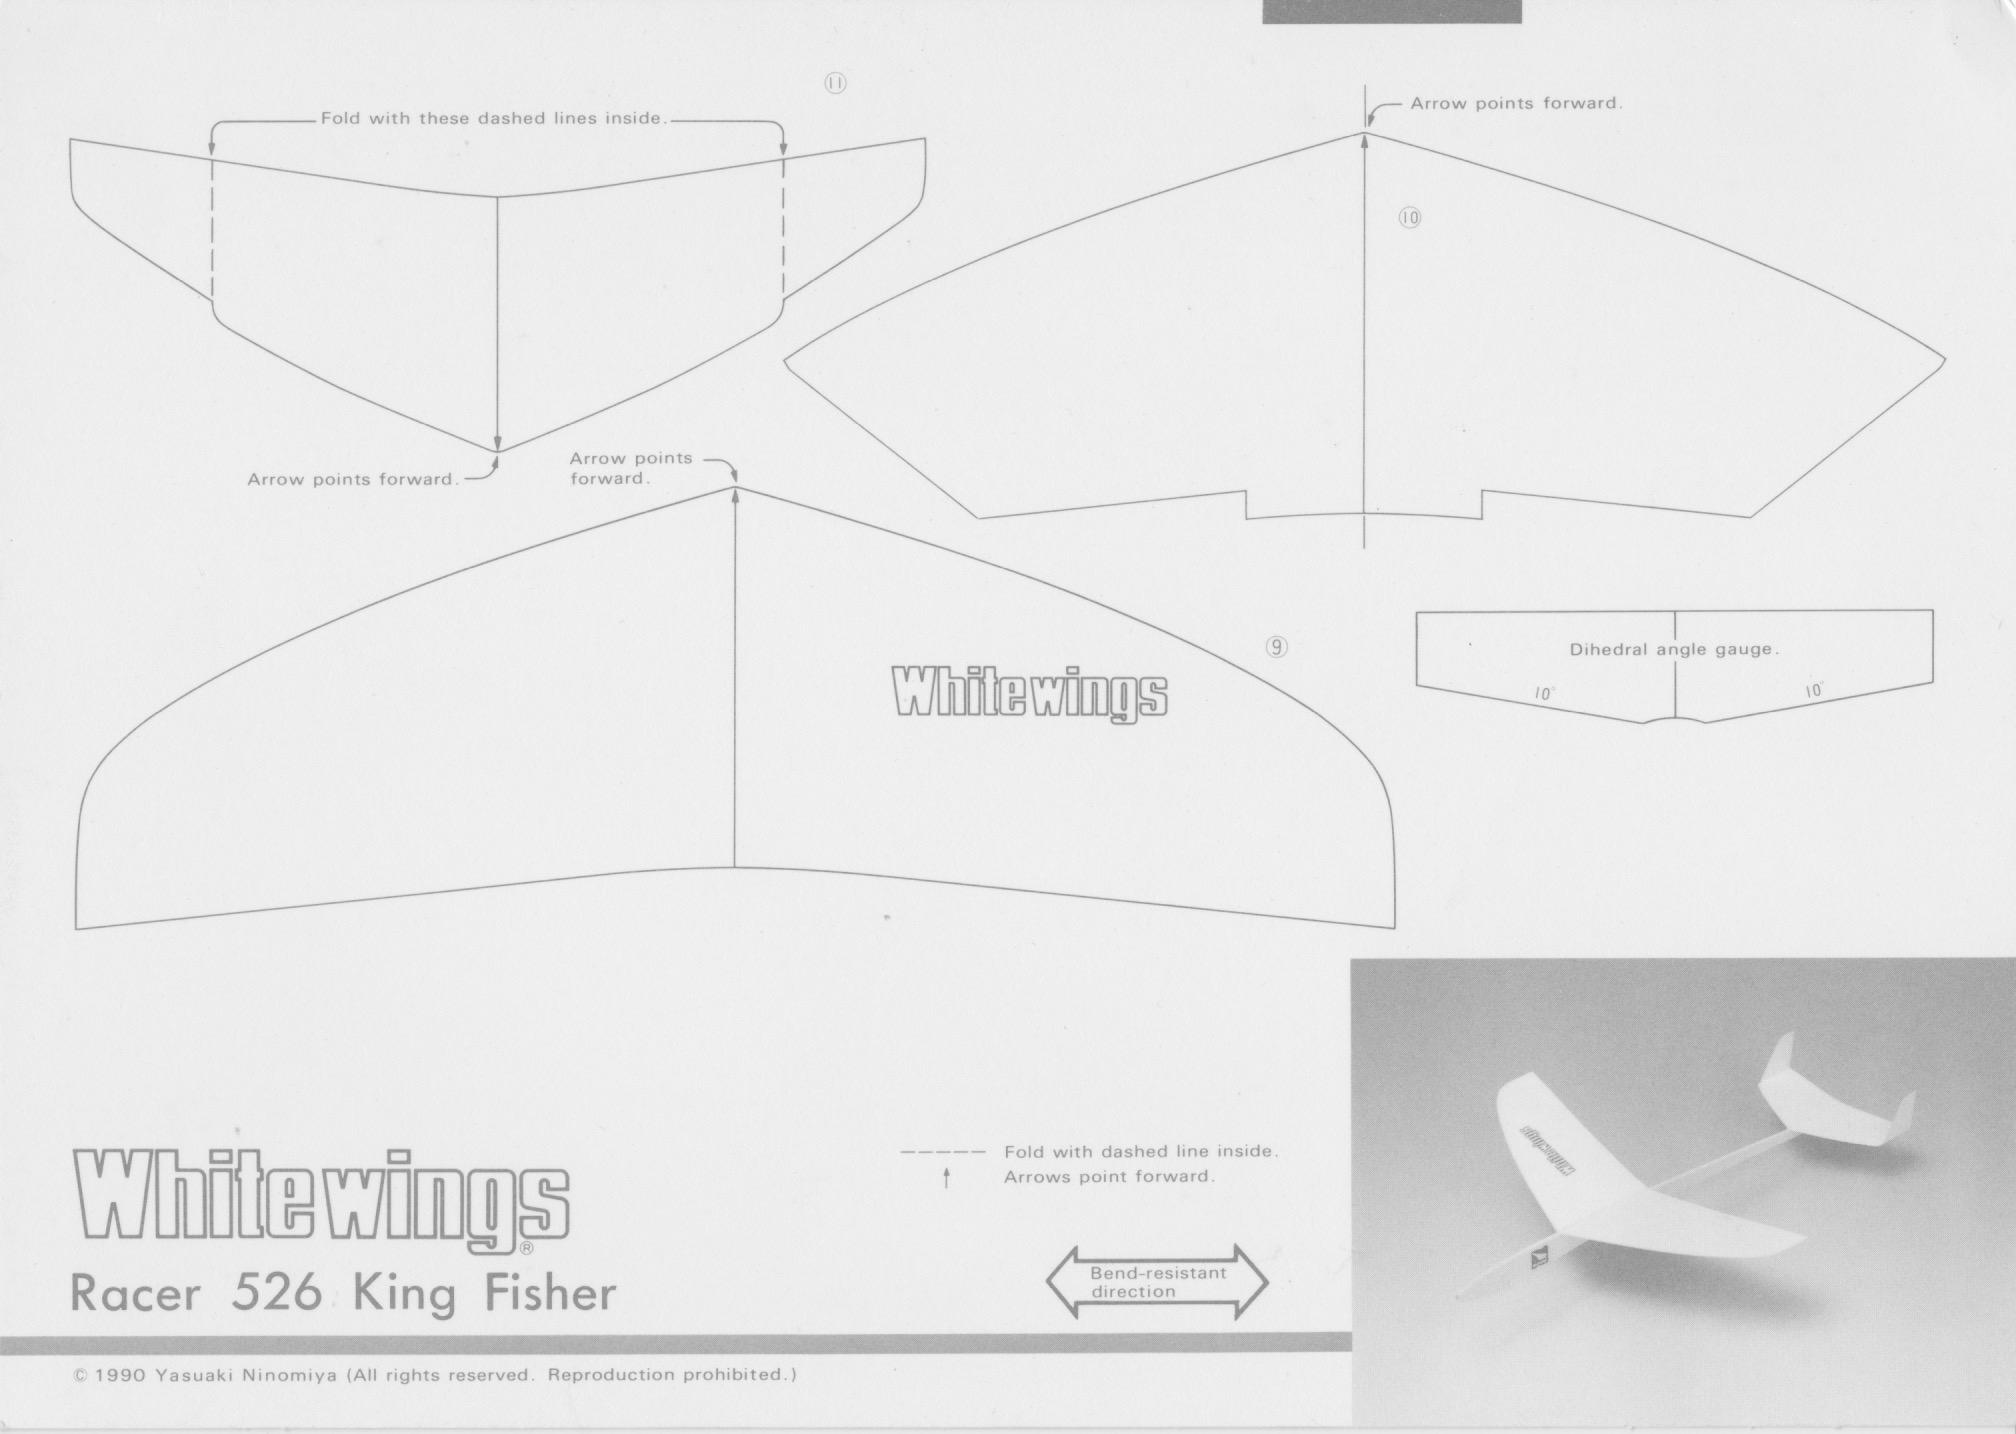 kingfisher_526_1.jpeg